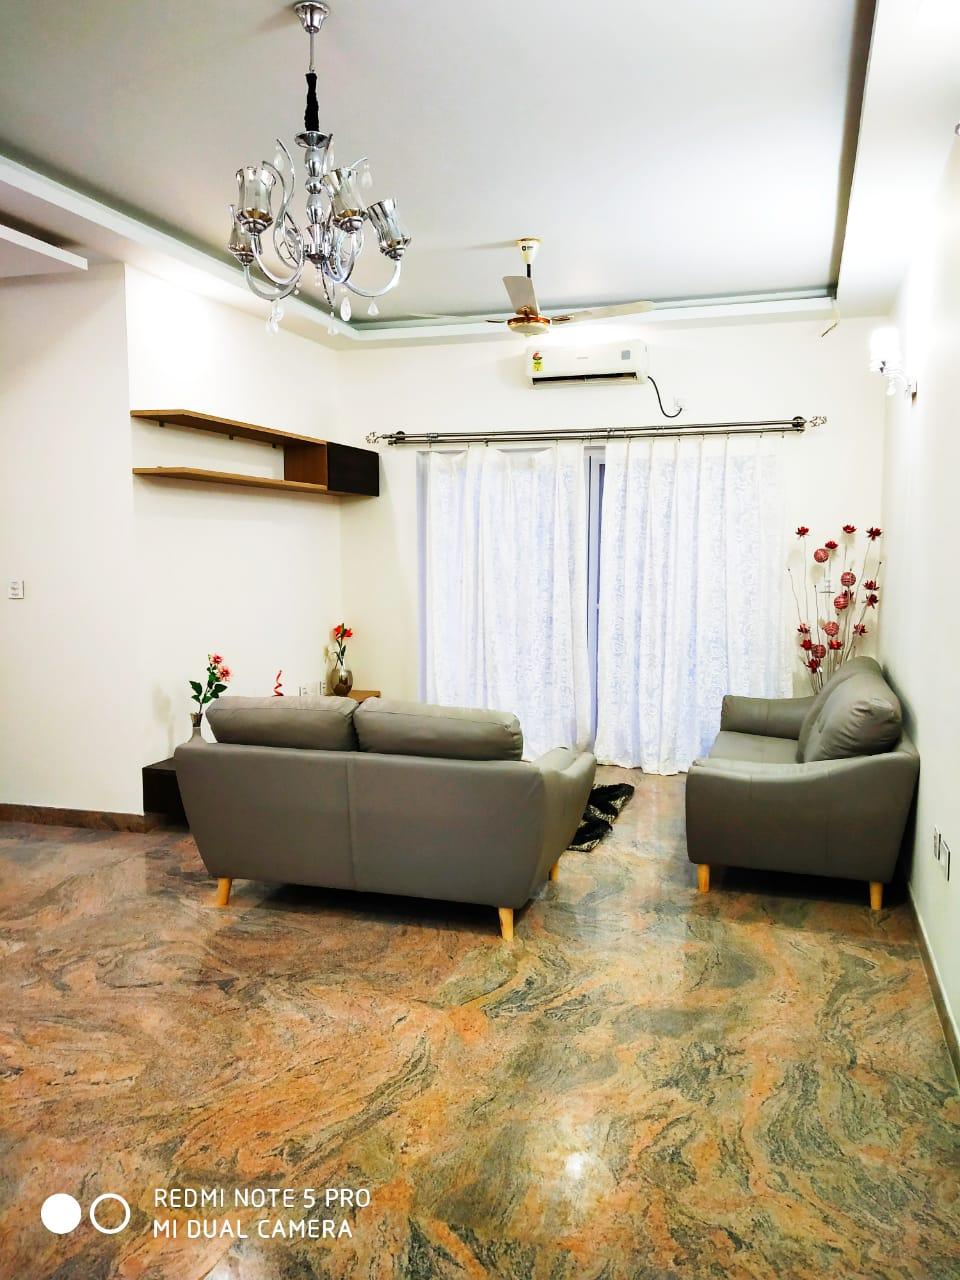 BSCPL-Bollineni-Astra-Kogilu-Cross-Apartments-Bangalore-Gallery-14